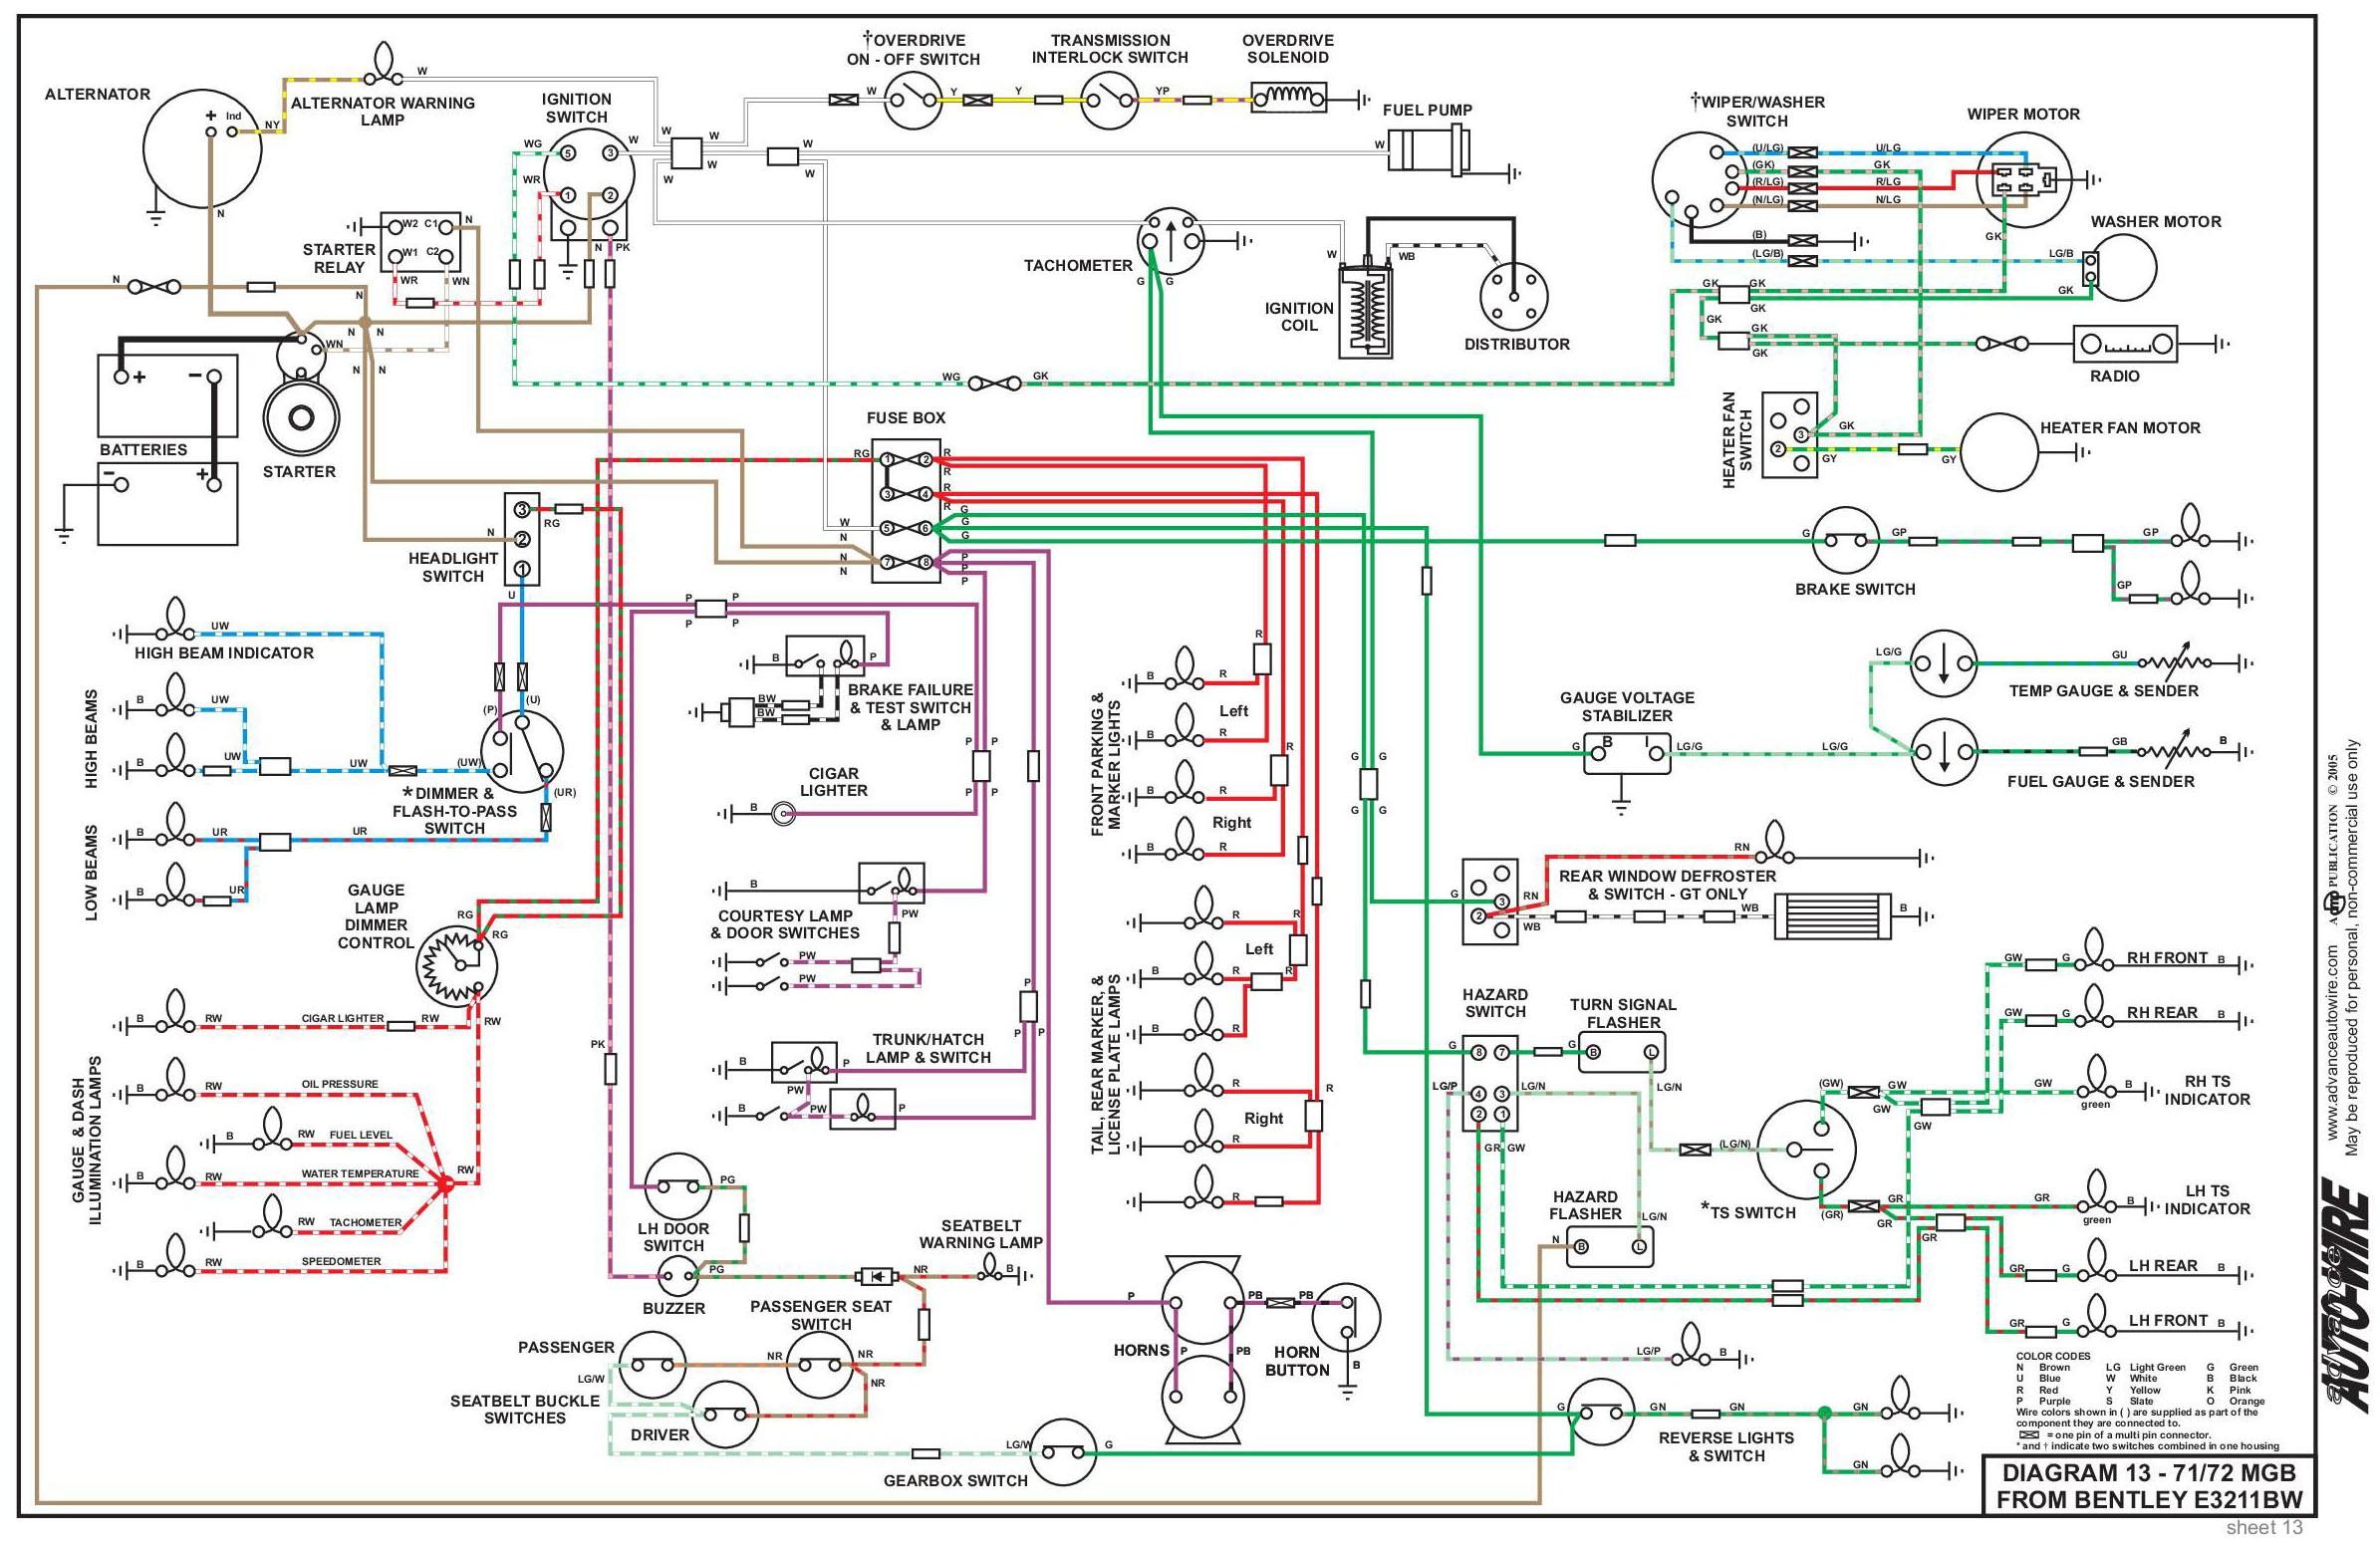 Diagram Big Stuff 3 Wiring Diagram Full Version Hd Quality Wiring Diagram Diagramsheap Unbroken Ilfilm It